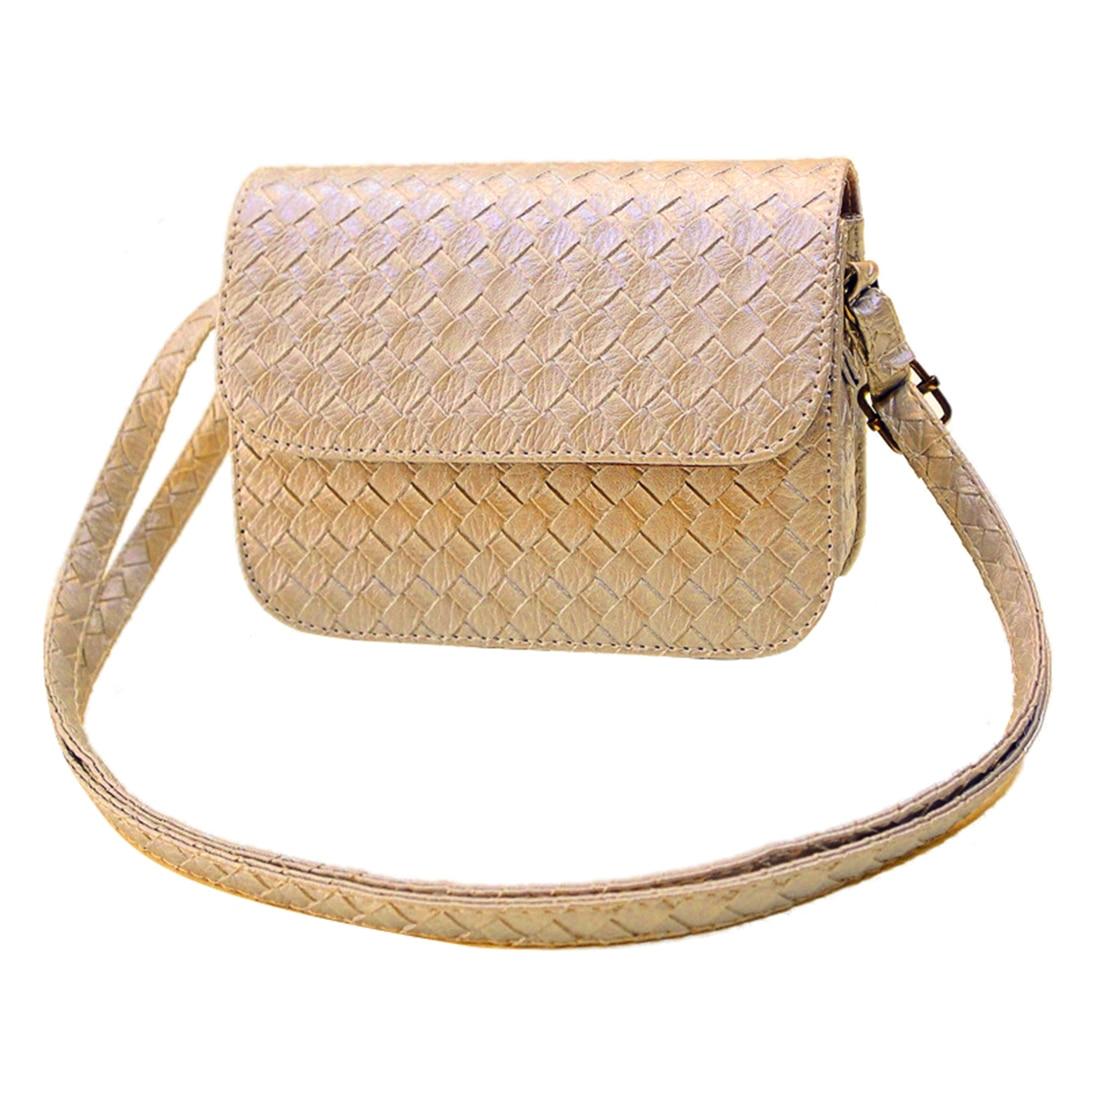 FGGS New Womens PU Leather Handbag Fashion Shoulder Bag Clutch Tote Purse Messenger(Gold) new womens shoulder leather bag clutch handbag tote purse hobo messenger bag popular